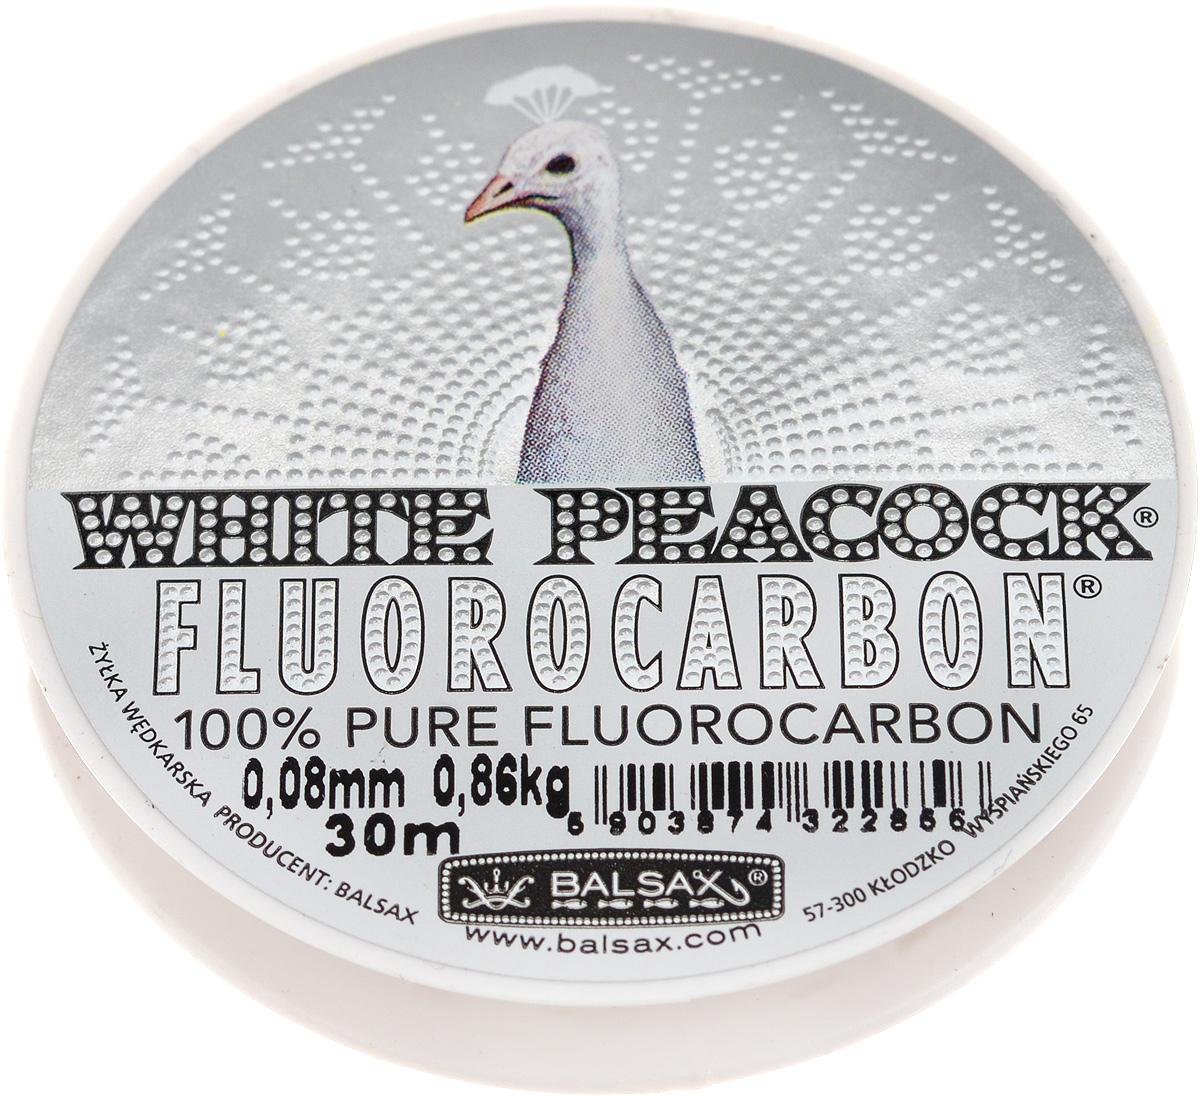 "Леска флюорокарбоновая Balsax ""White Peacock"", 30 м, 0,08 мм, 0,86 кг 310-15008"